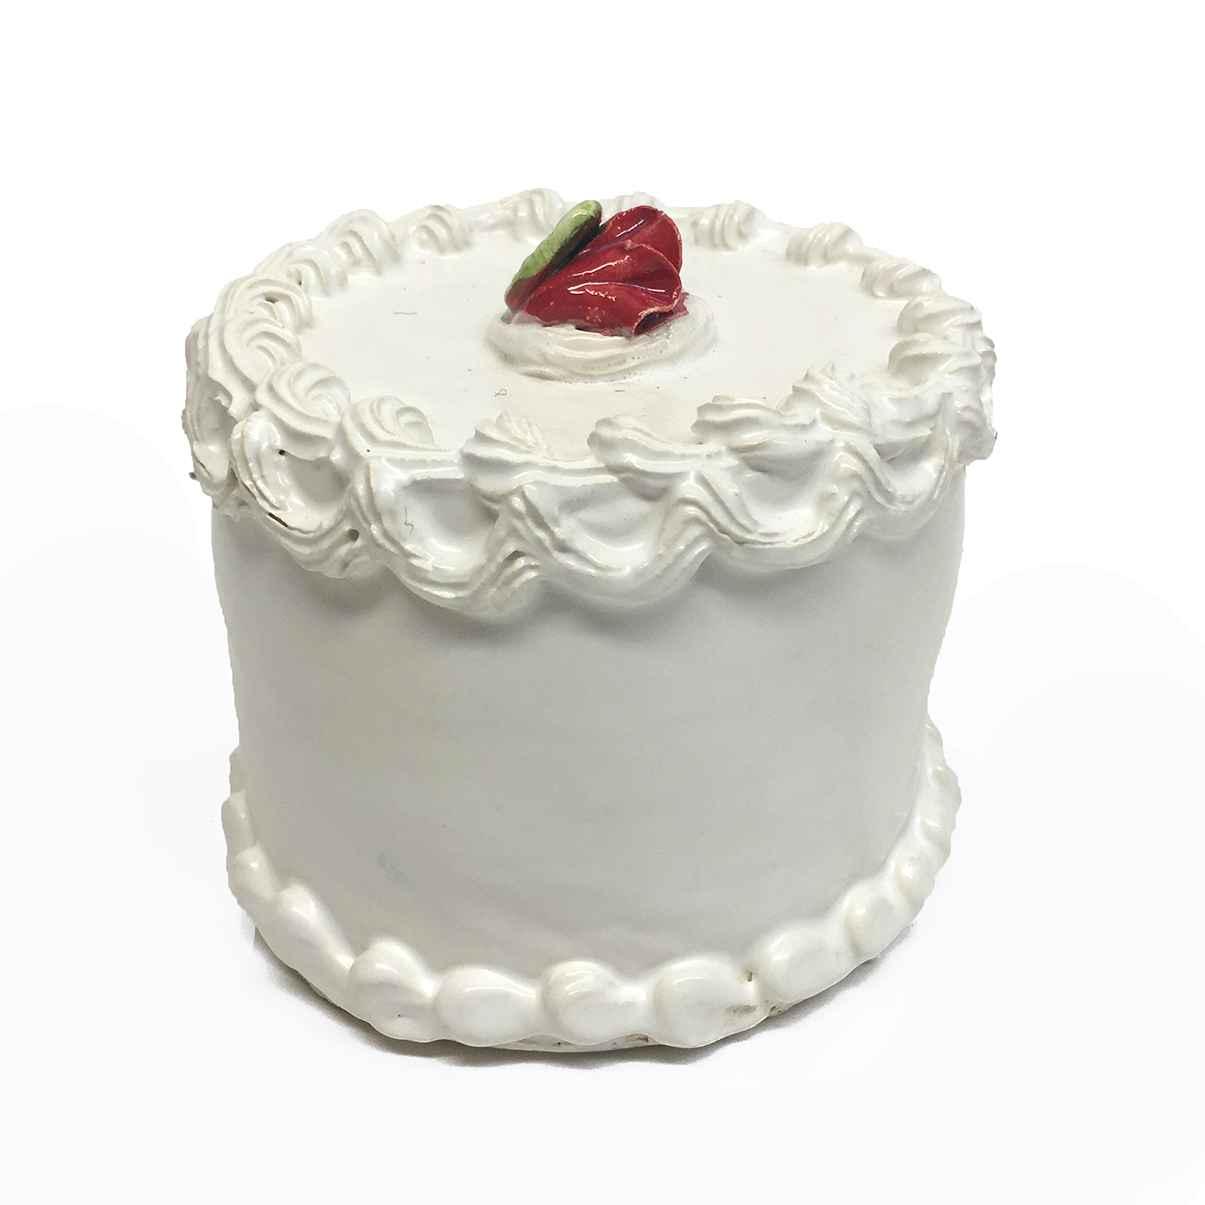 Rosebud Topped Cake  by  Jeff Nebeker